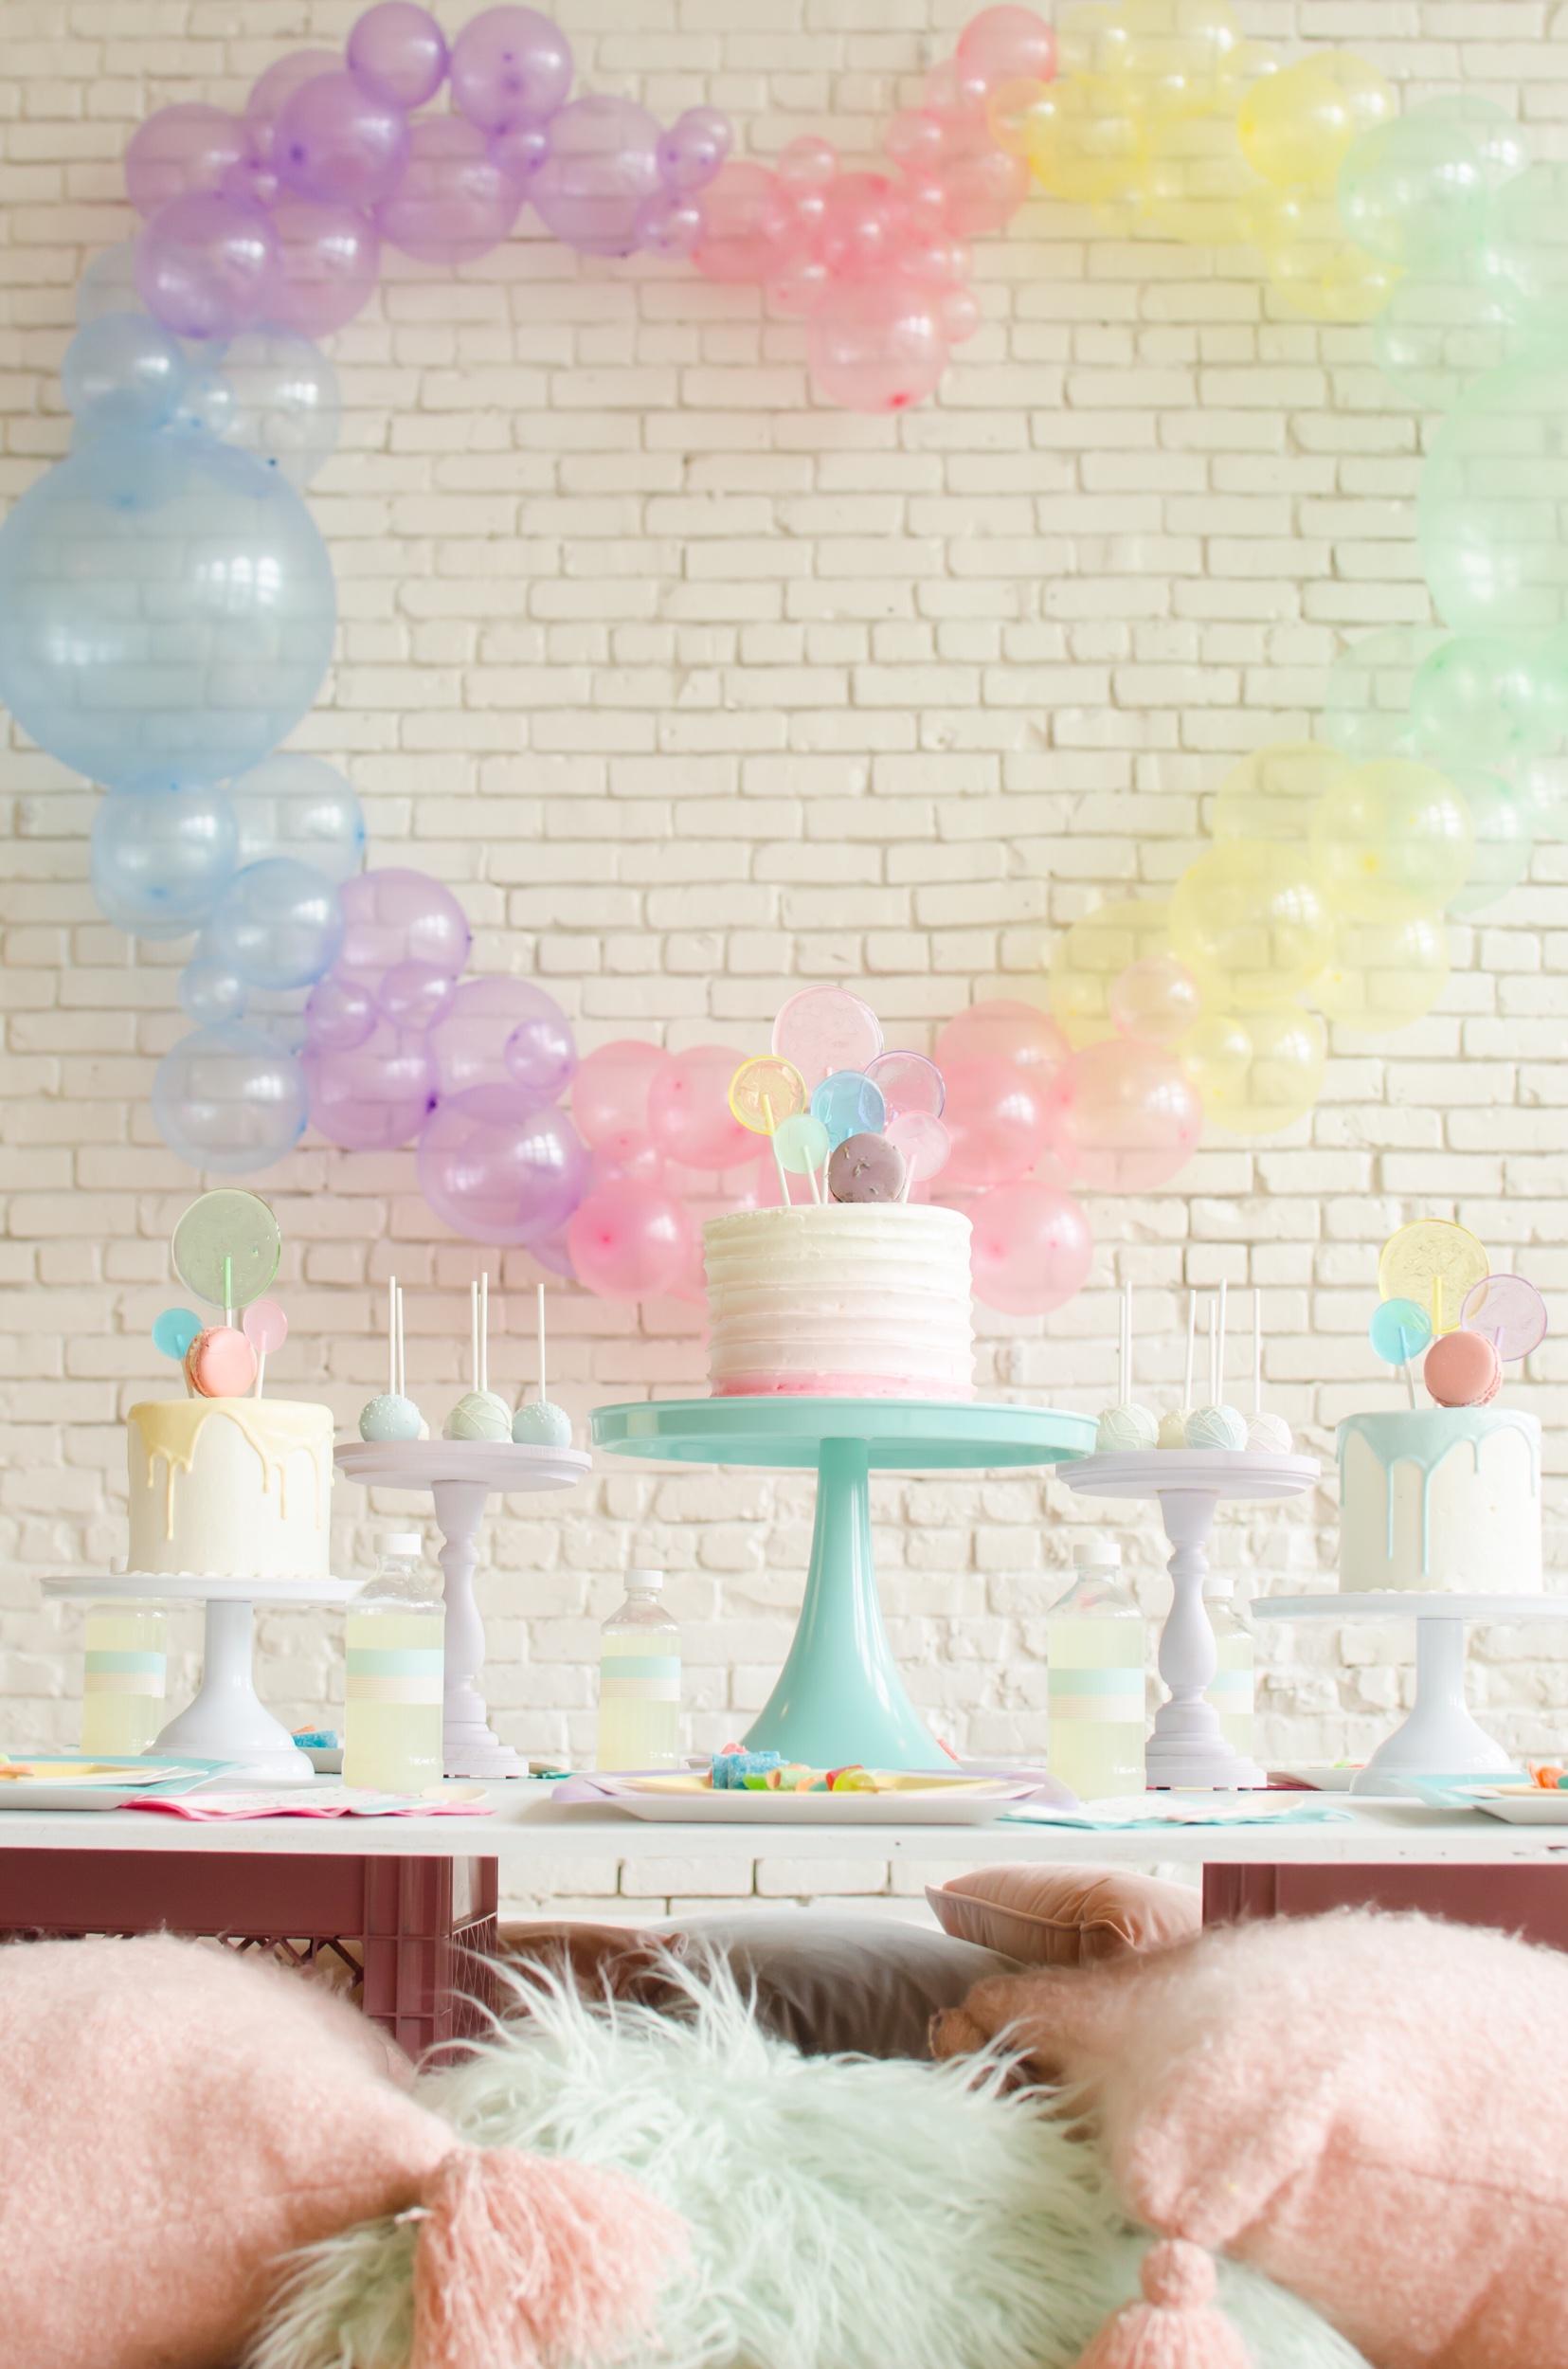 Cute balloon heart ideas